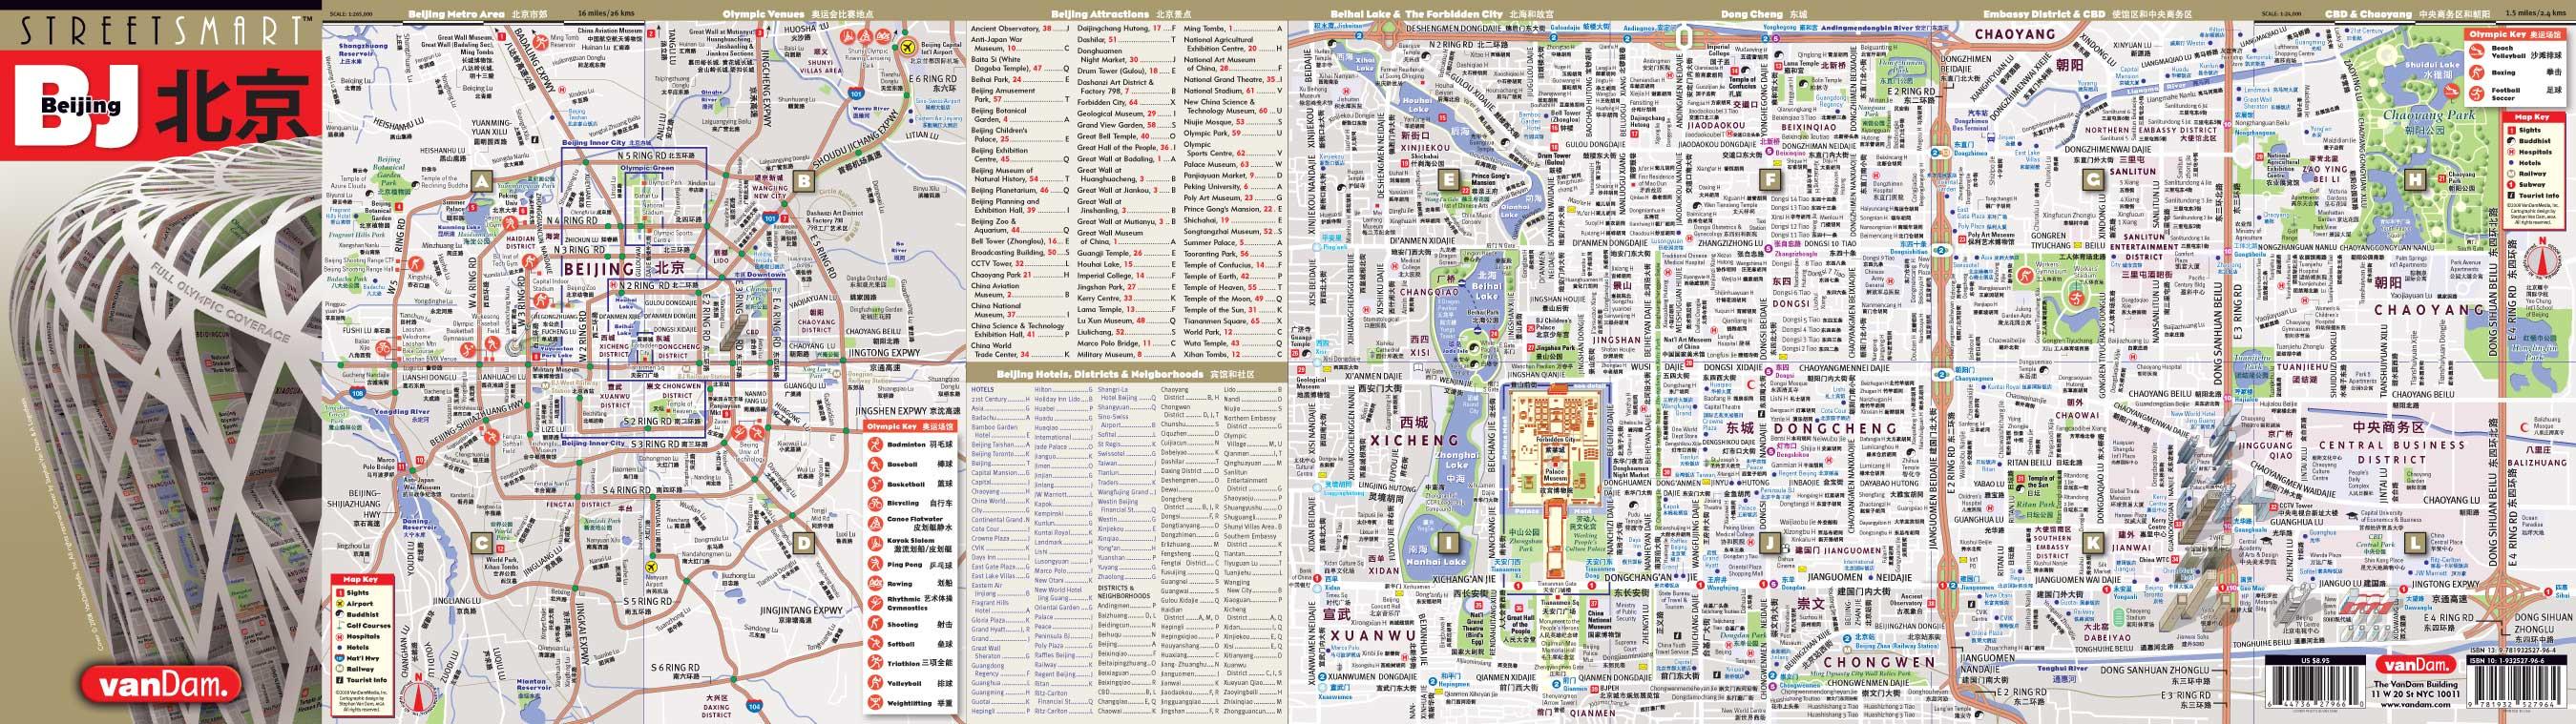 Beijing Map By VanDam Beijing StreetSmart Map City Street Maps - Nyc unfolds map